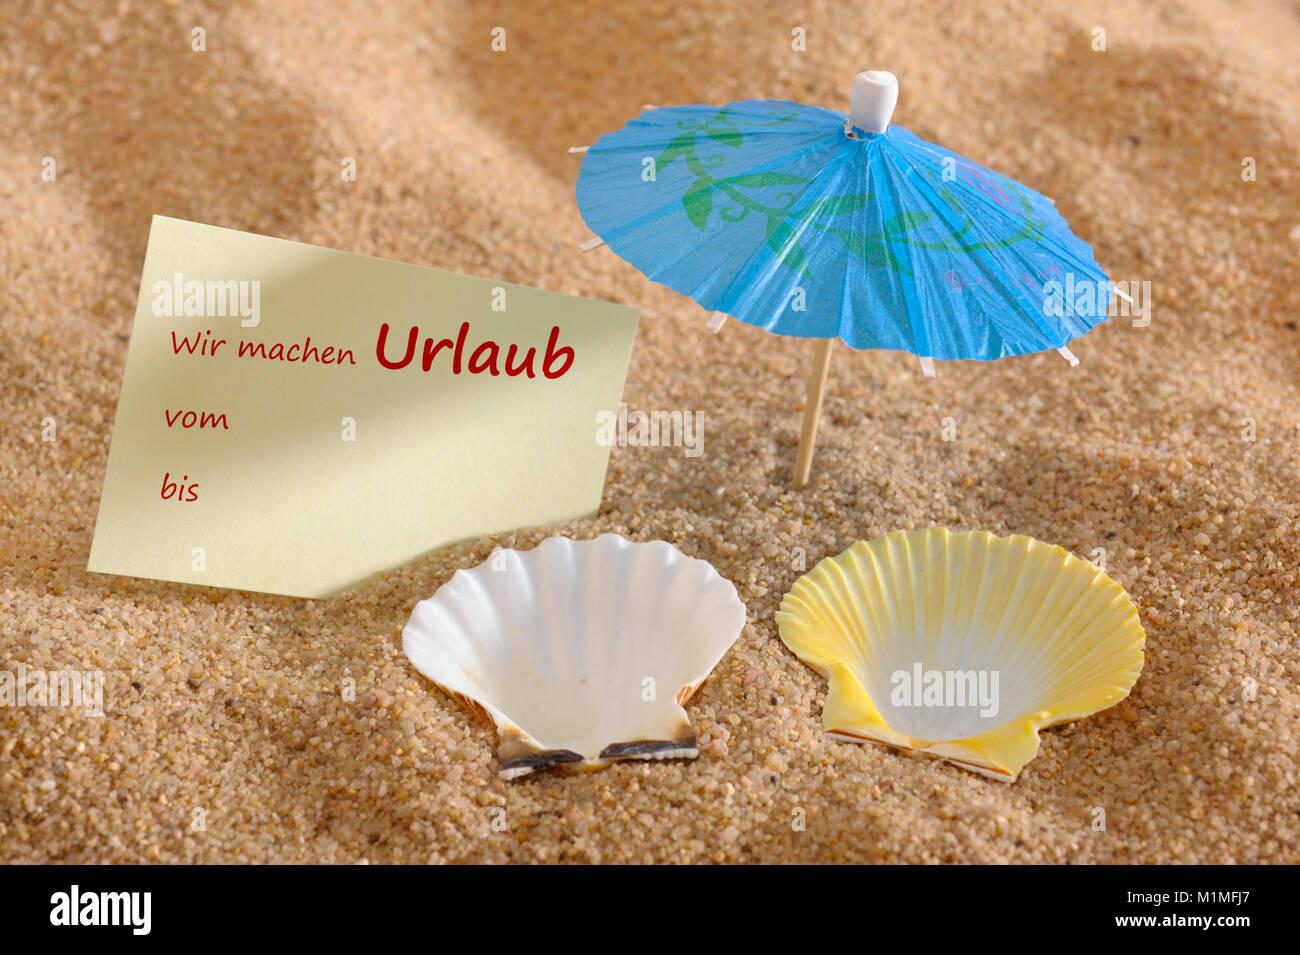 Urlaub Ferien am dem Strand mit Abwesenheitsnotiz Stockbild